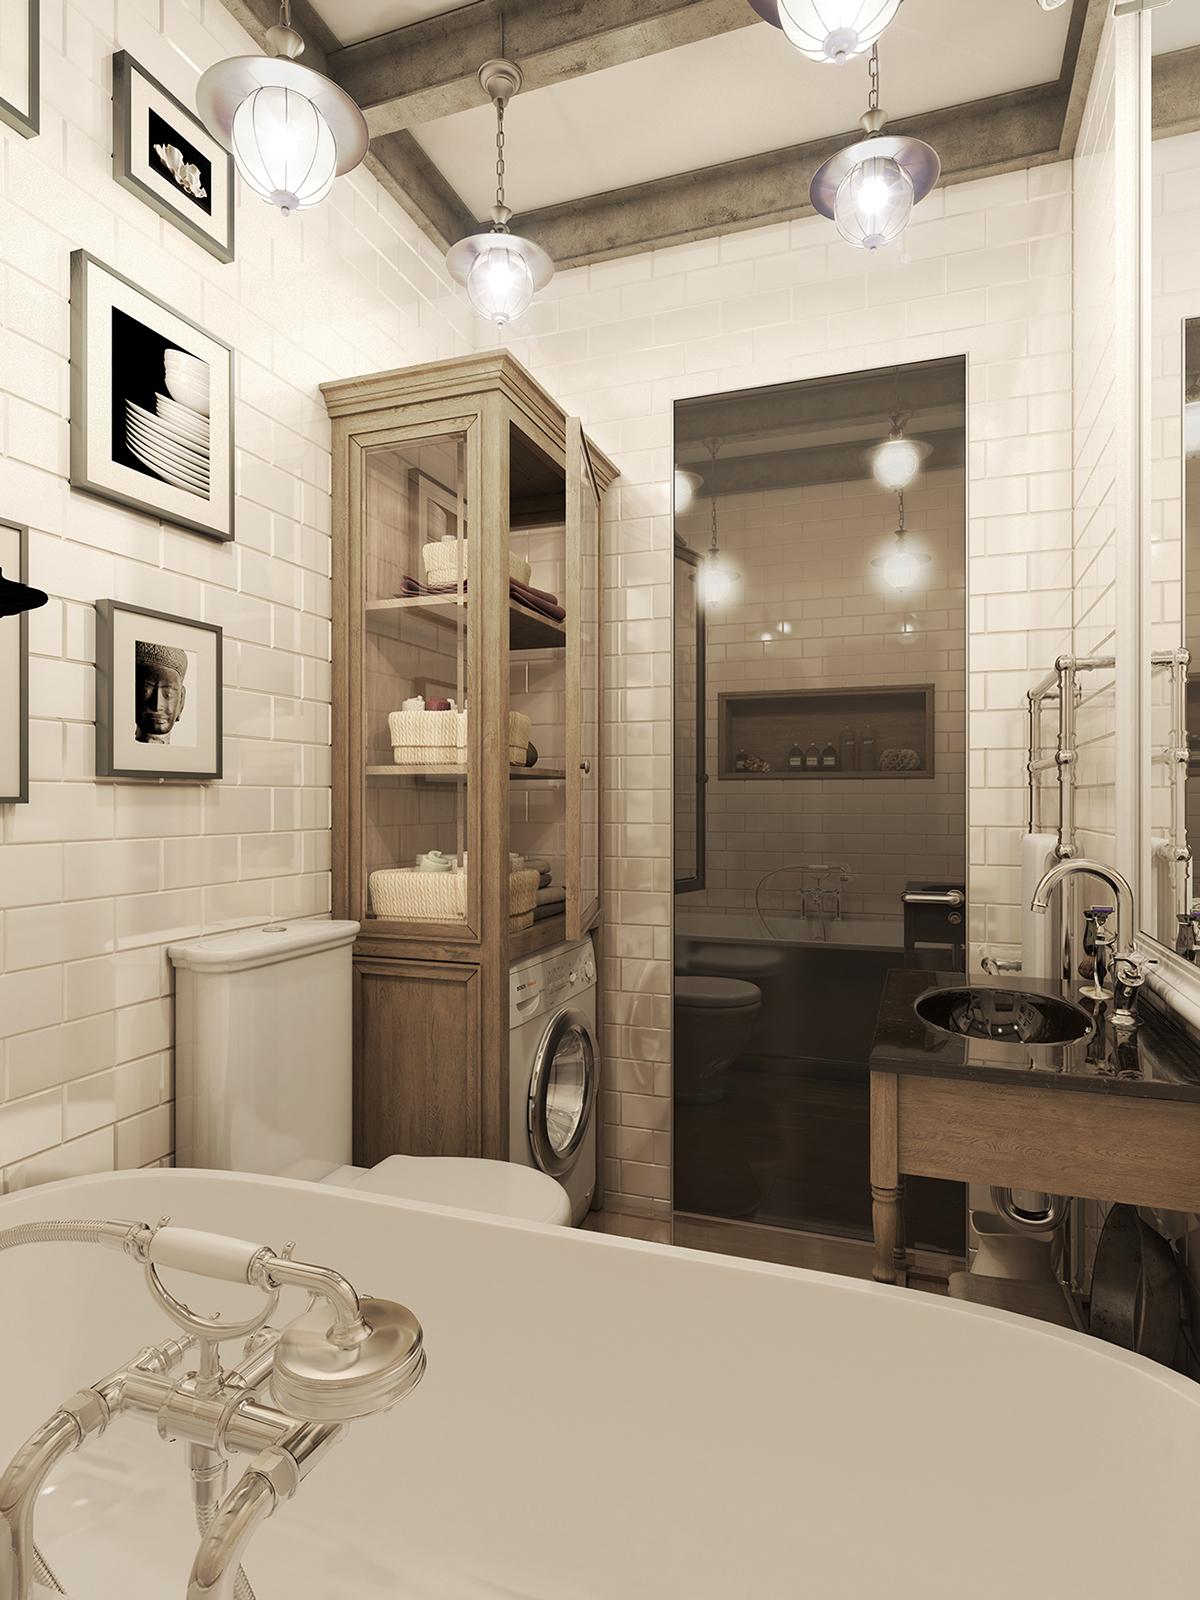 Dark Color For Small Apartment Interior Design With